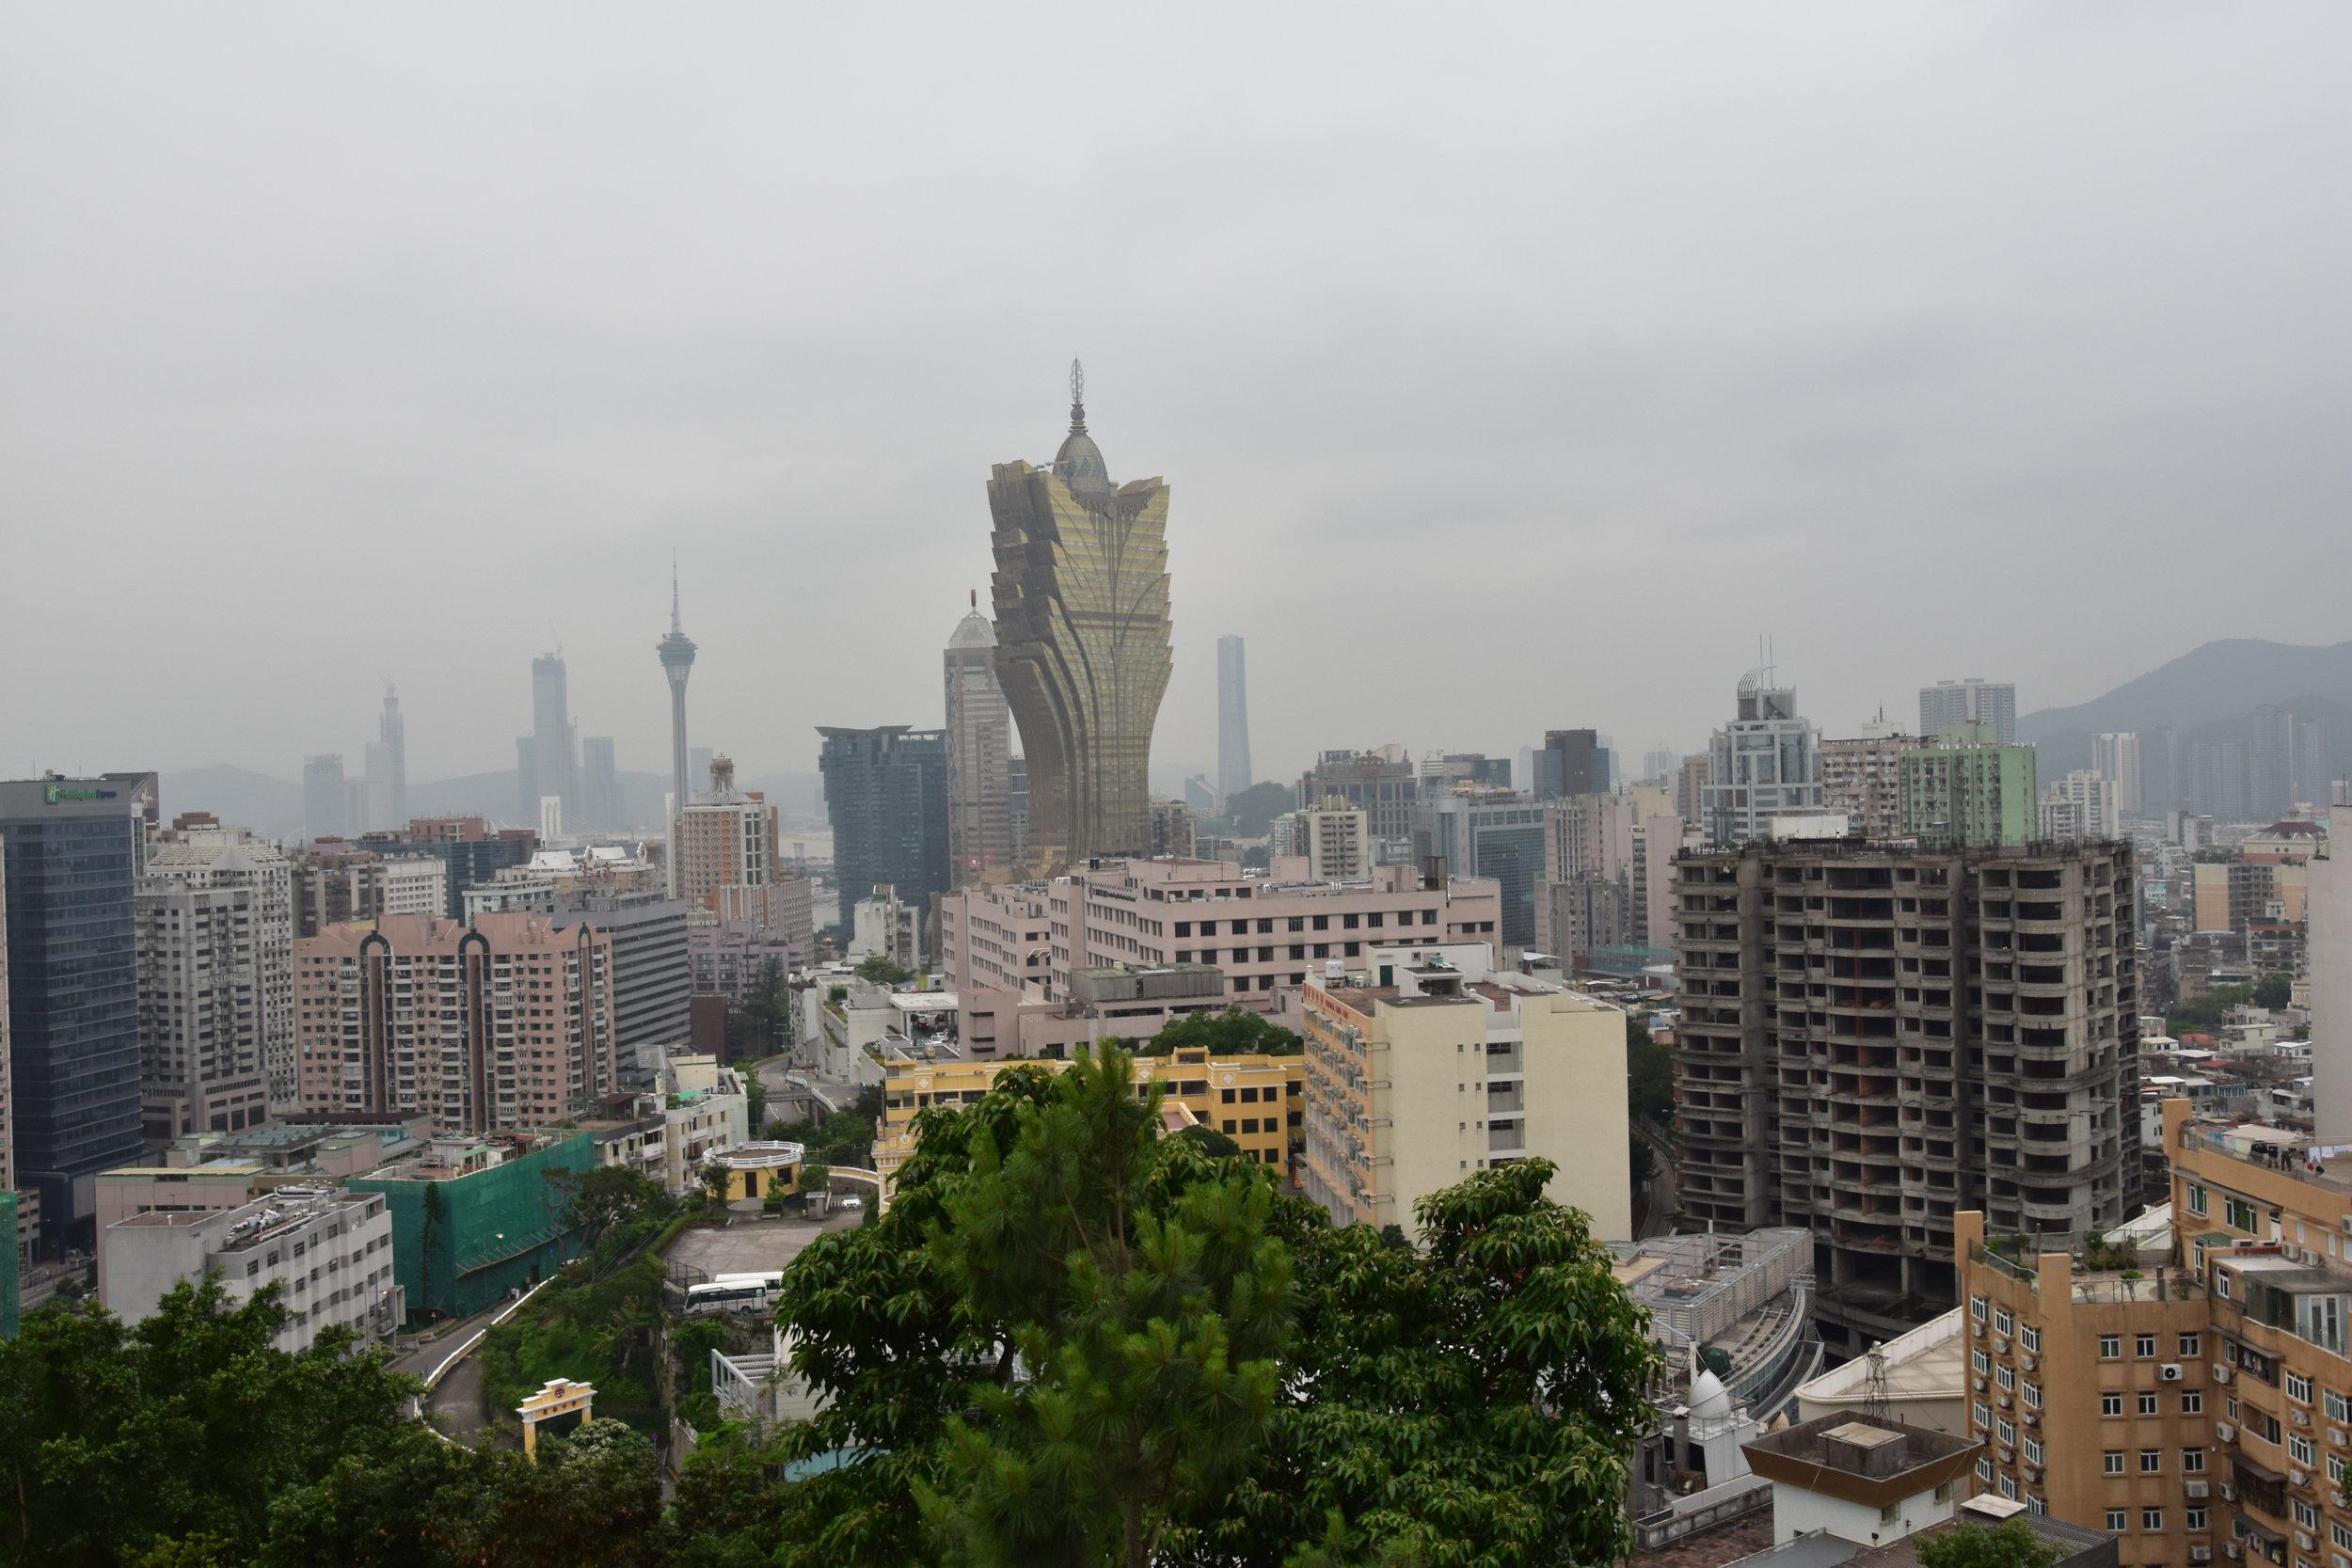 Macau skyline from Guia Fortress